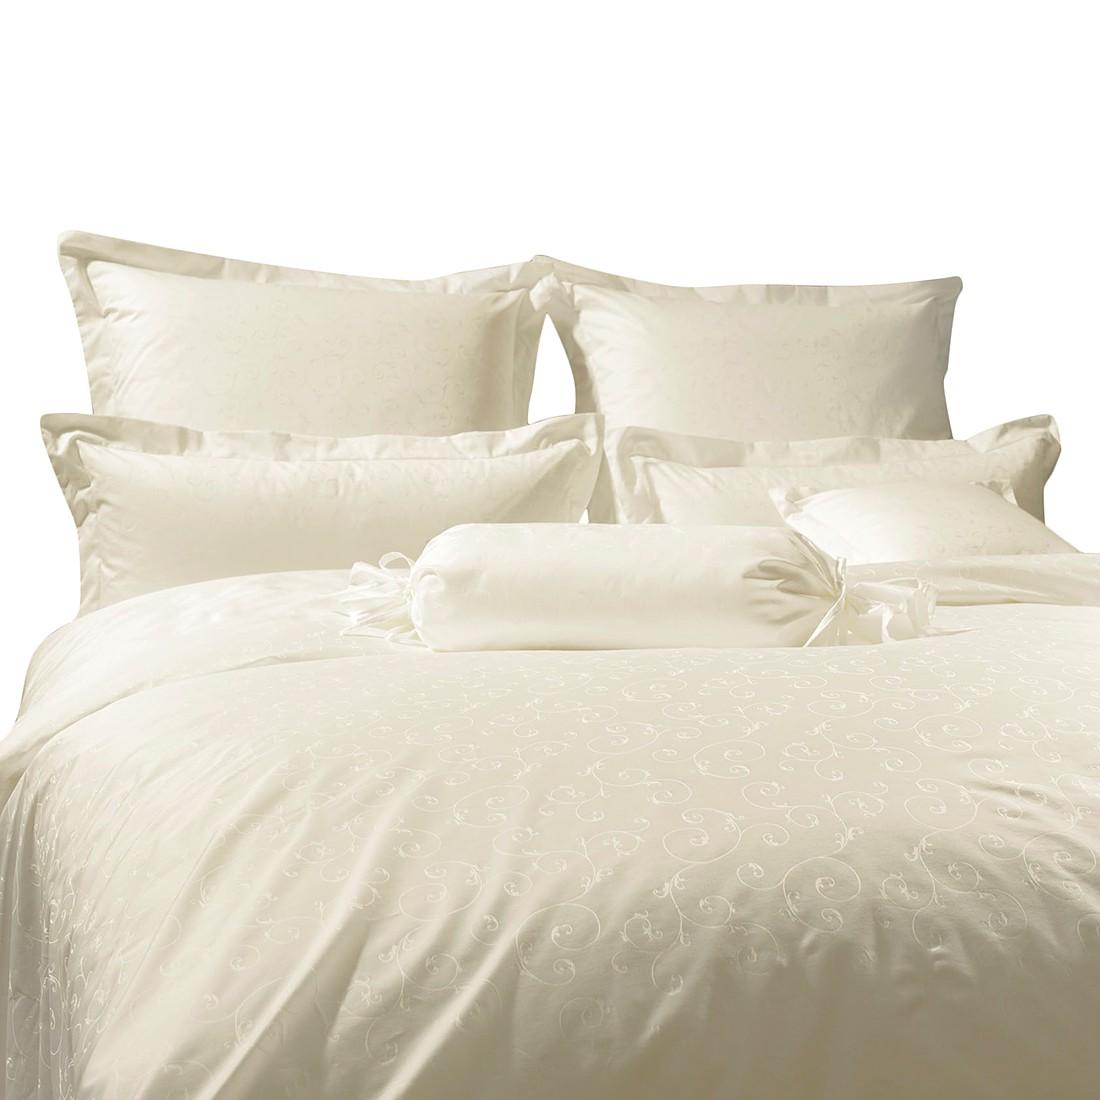 Home 24 - Taie d oreiller rubin - avec broderie - beige - 40 x 80 cm, janine